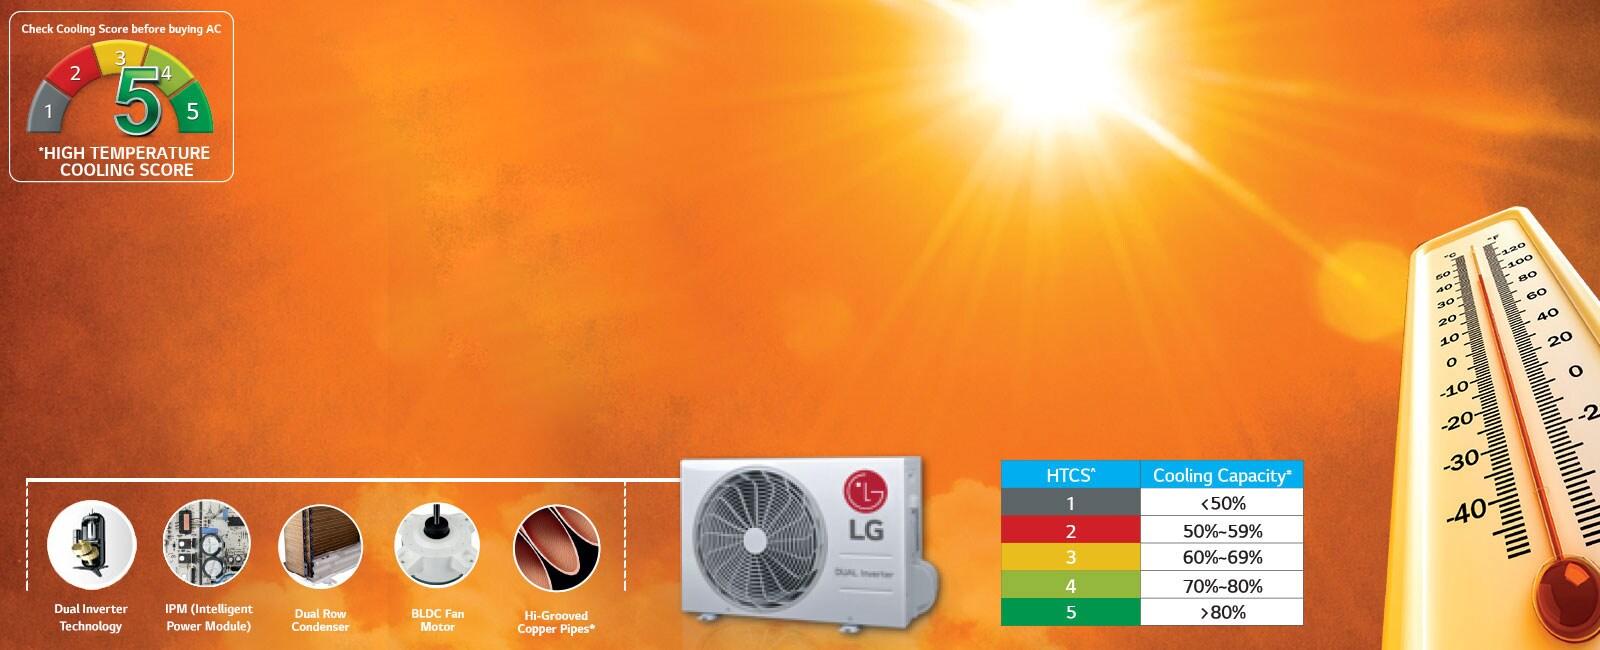 LG LS-Q18BNYD High Temperature Cooling Score